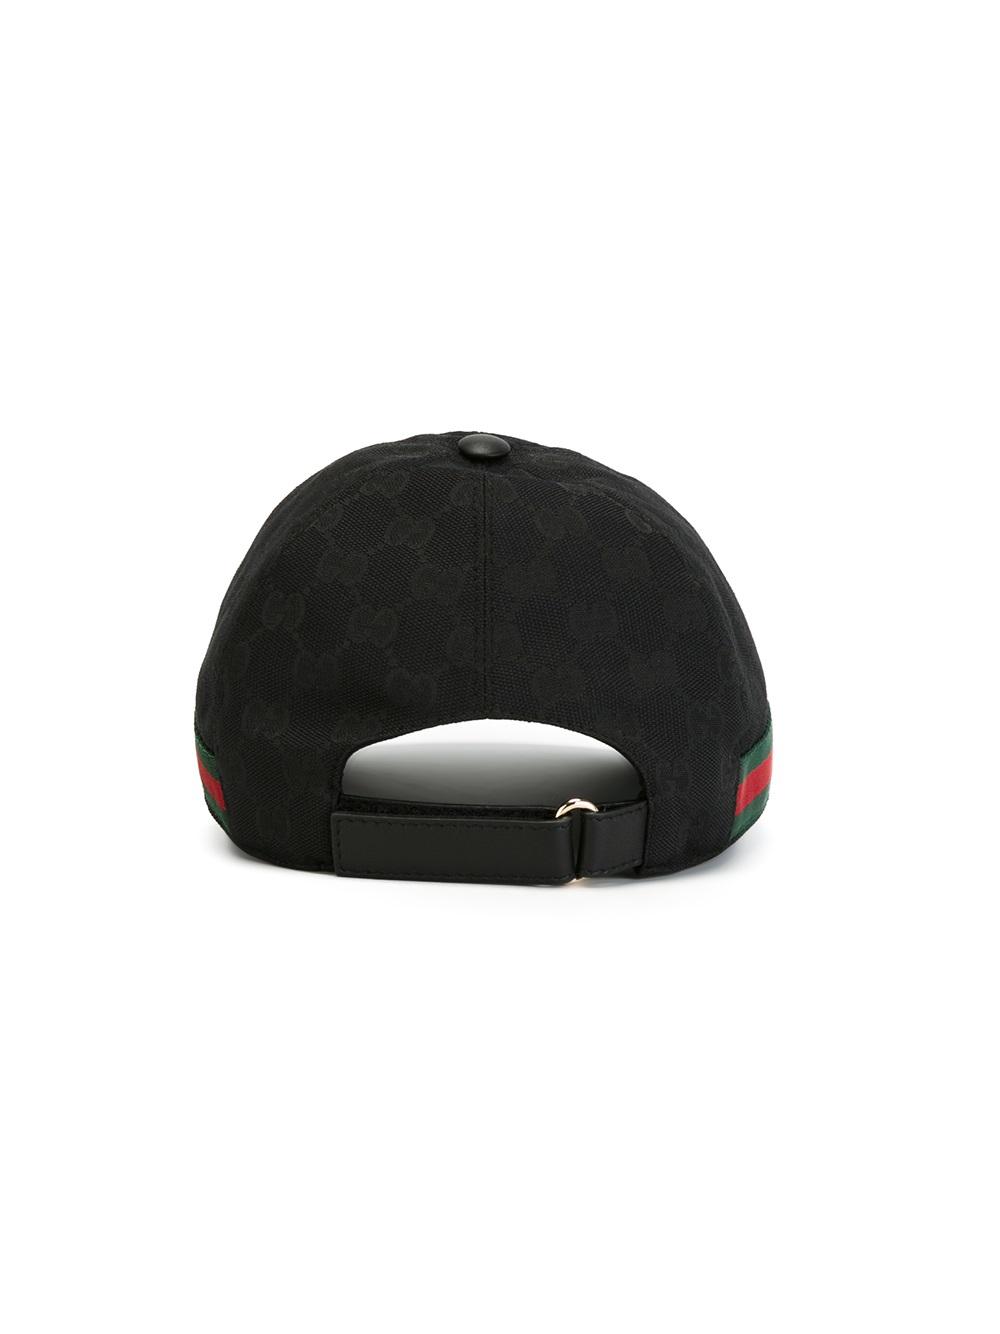 Lyst - Gucci Original Gg Canvas Baseball Hat for Men 03051e2d821